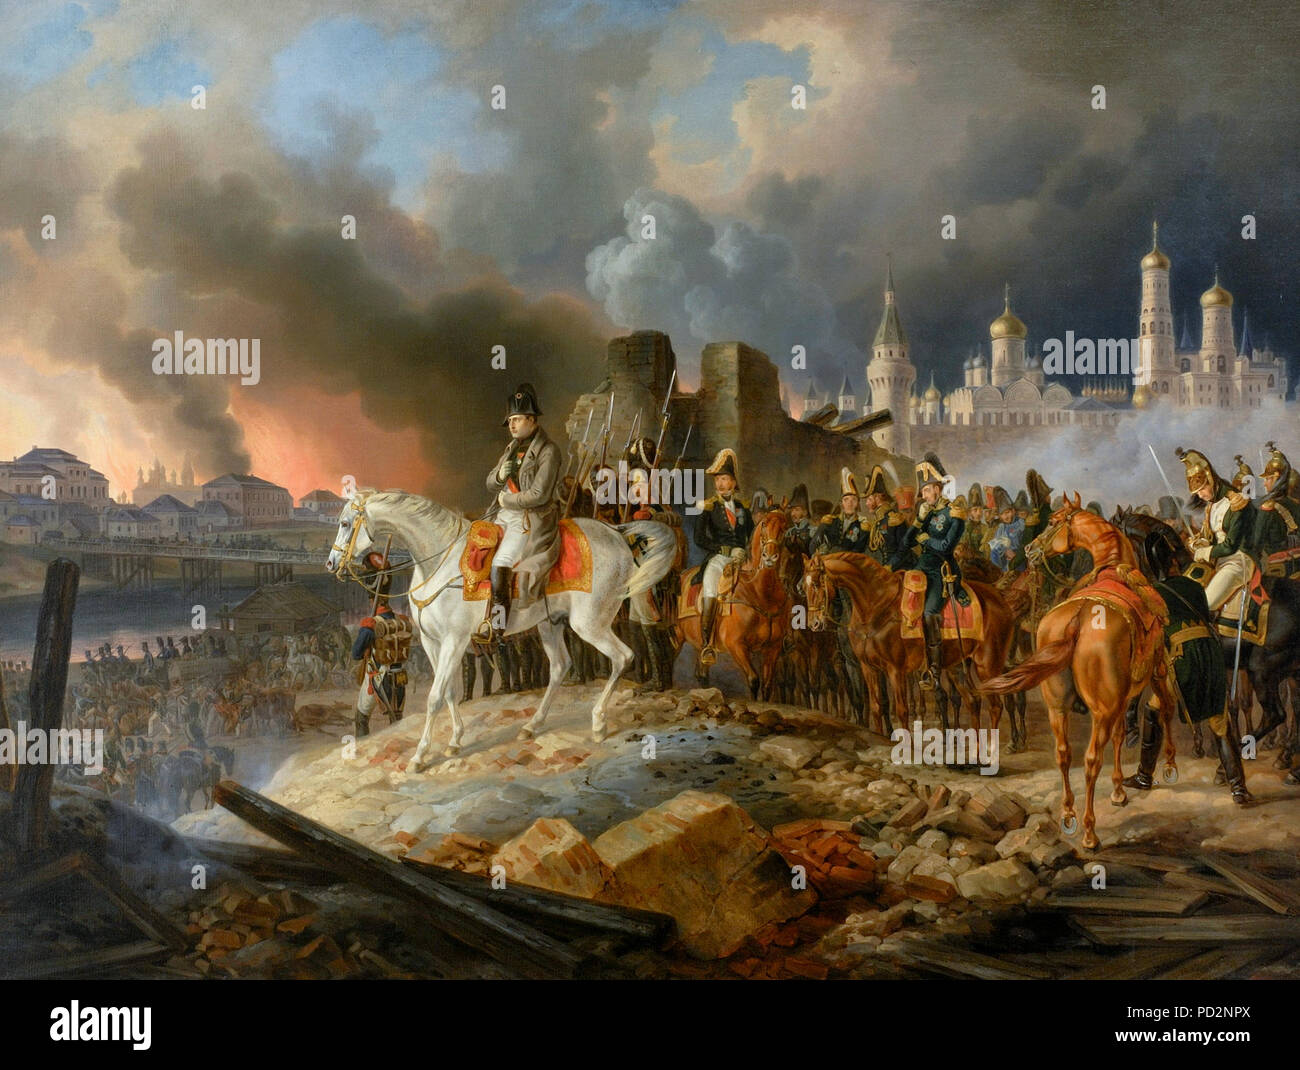 Napoleon in burning Moscow - Adam Albrecht (1841) - Stock Image